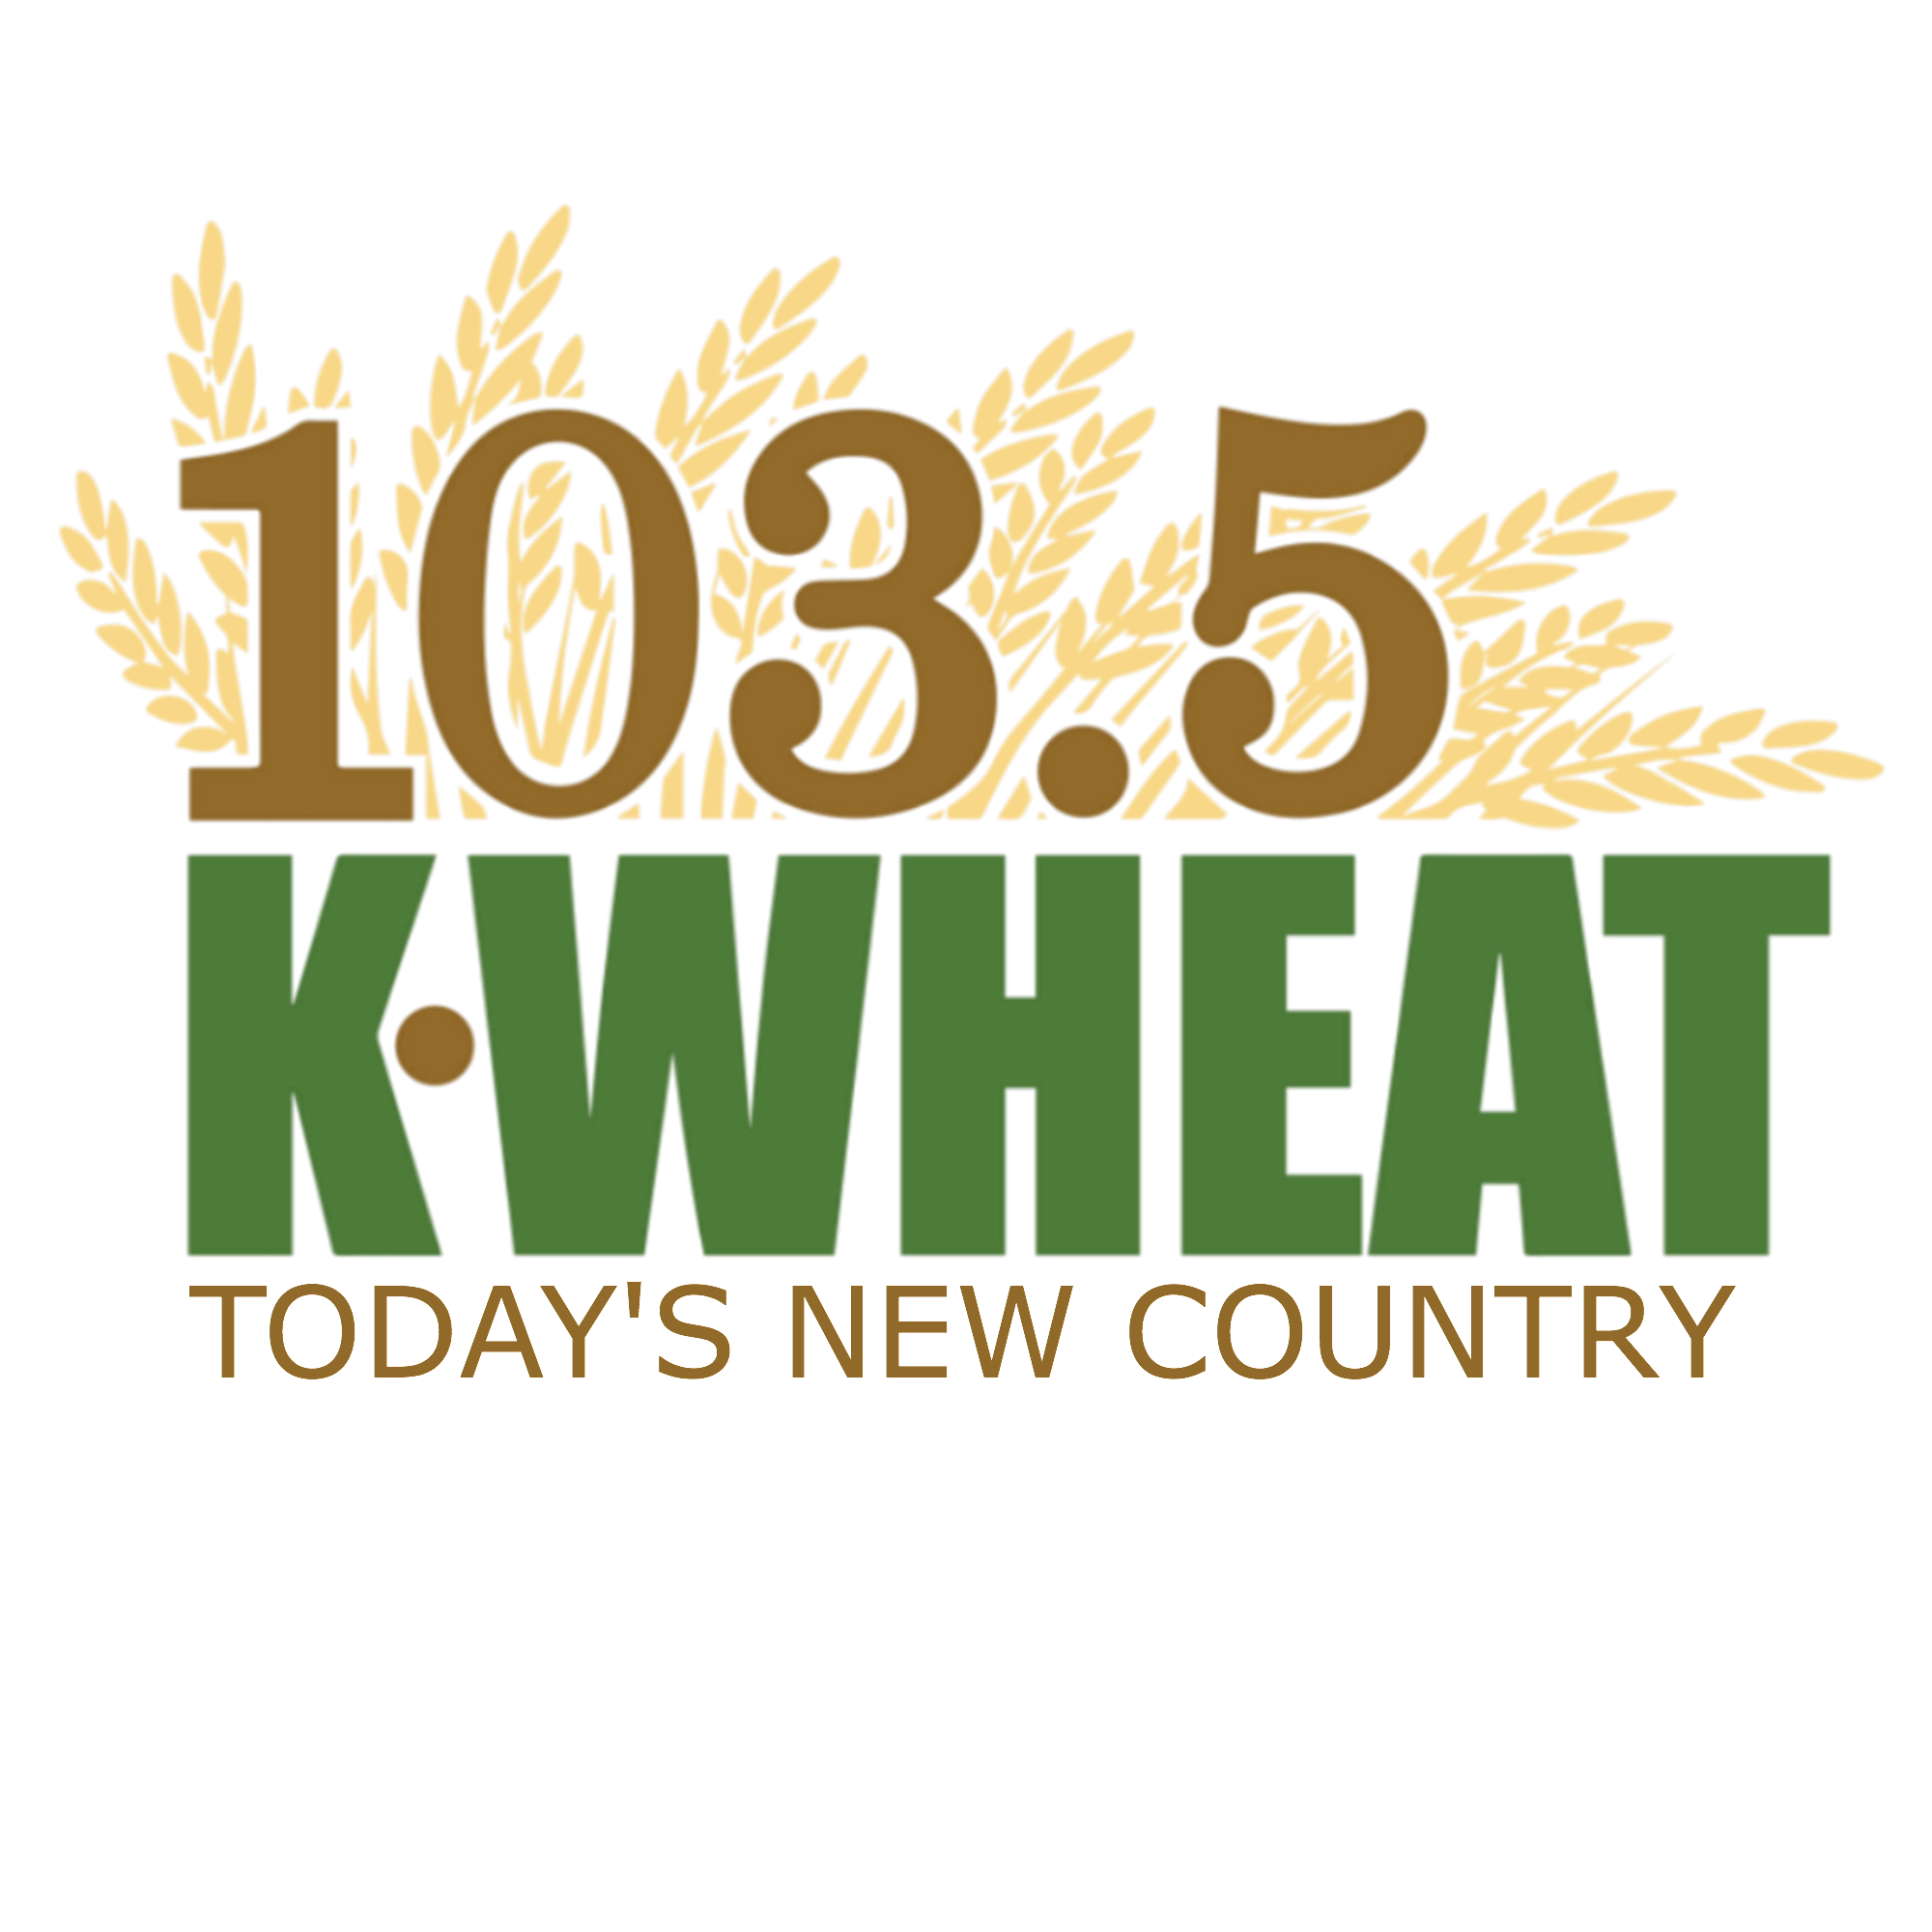 103.5 K•Wheat